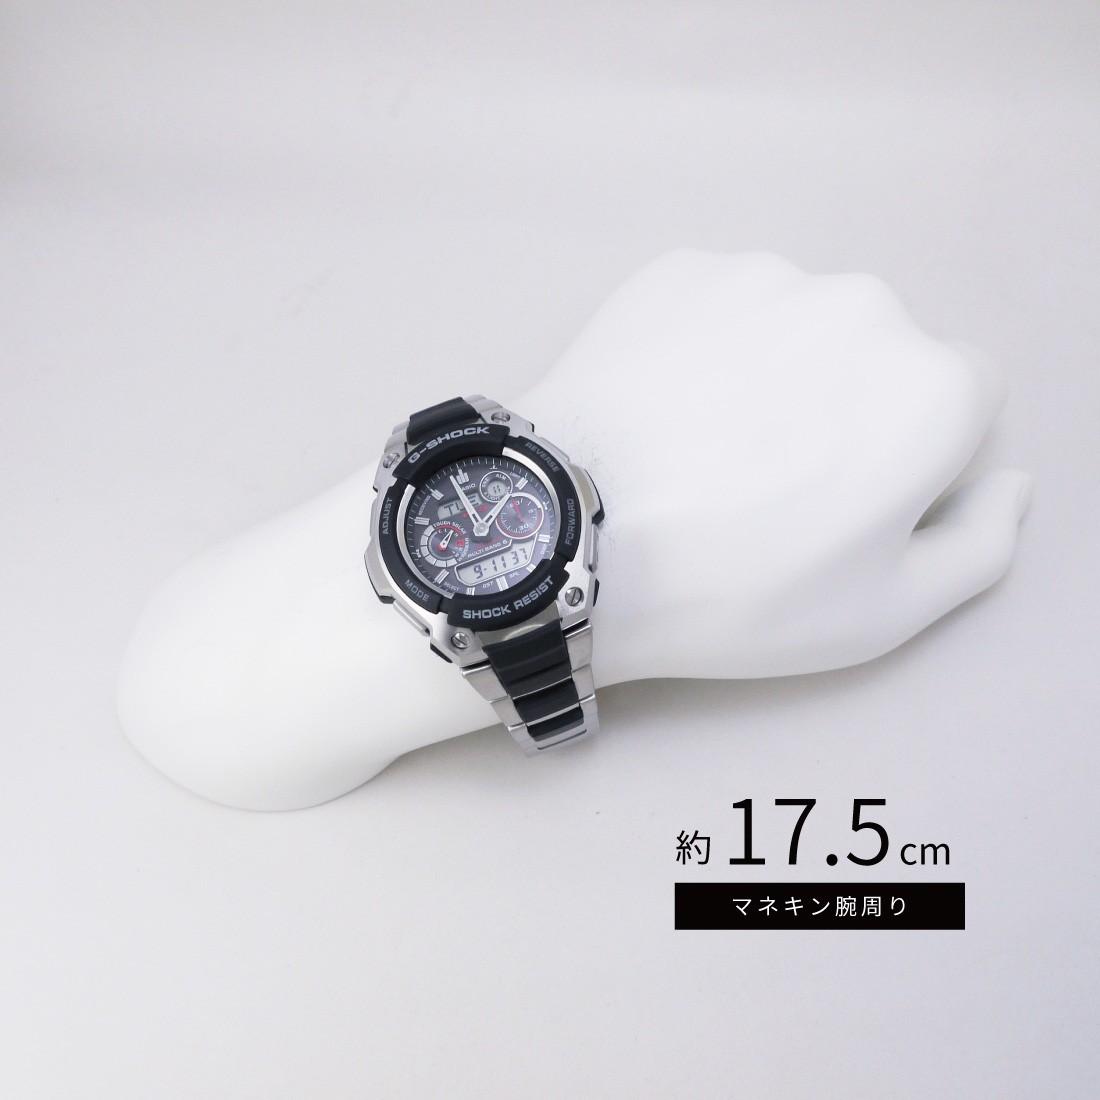 CASIO カシオ 腕時計 G-SHOCK ジーショック Gショ... - 腕時計ショップ newest